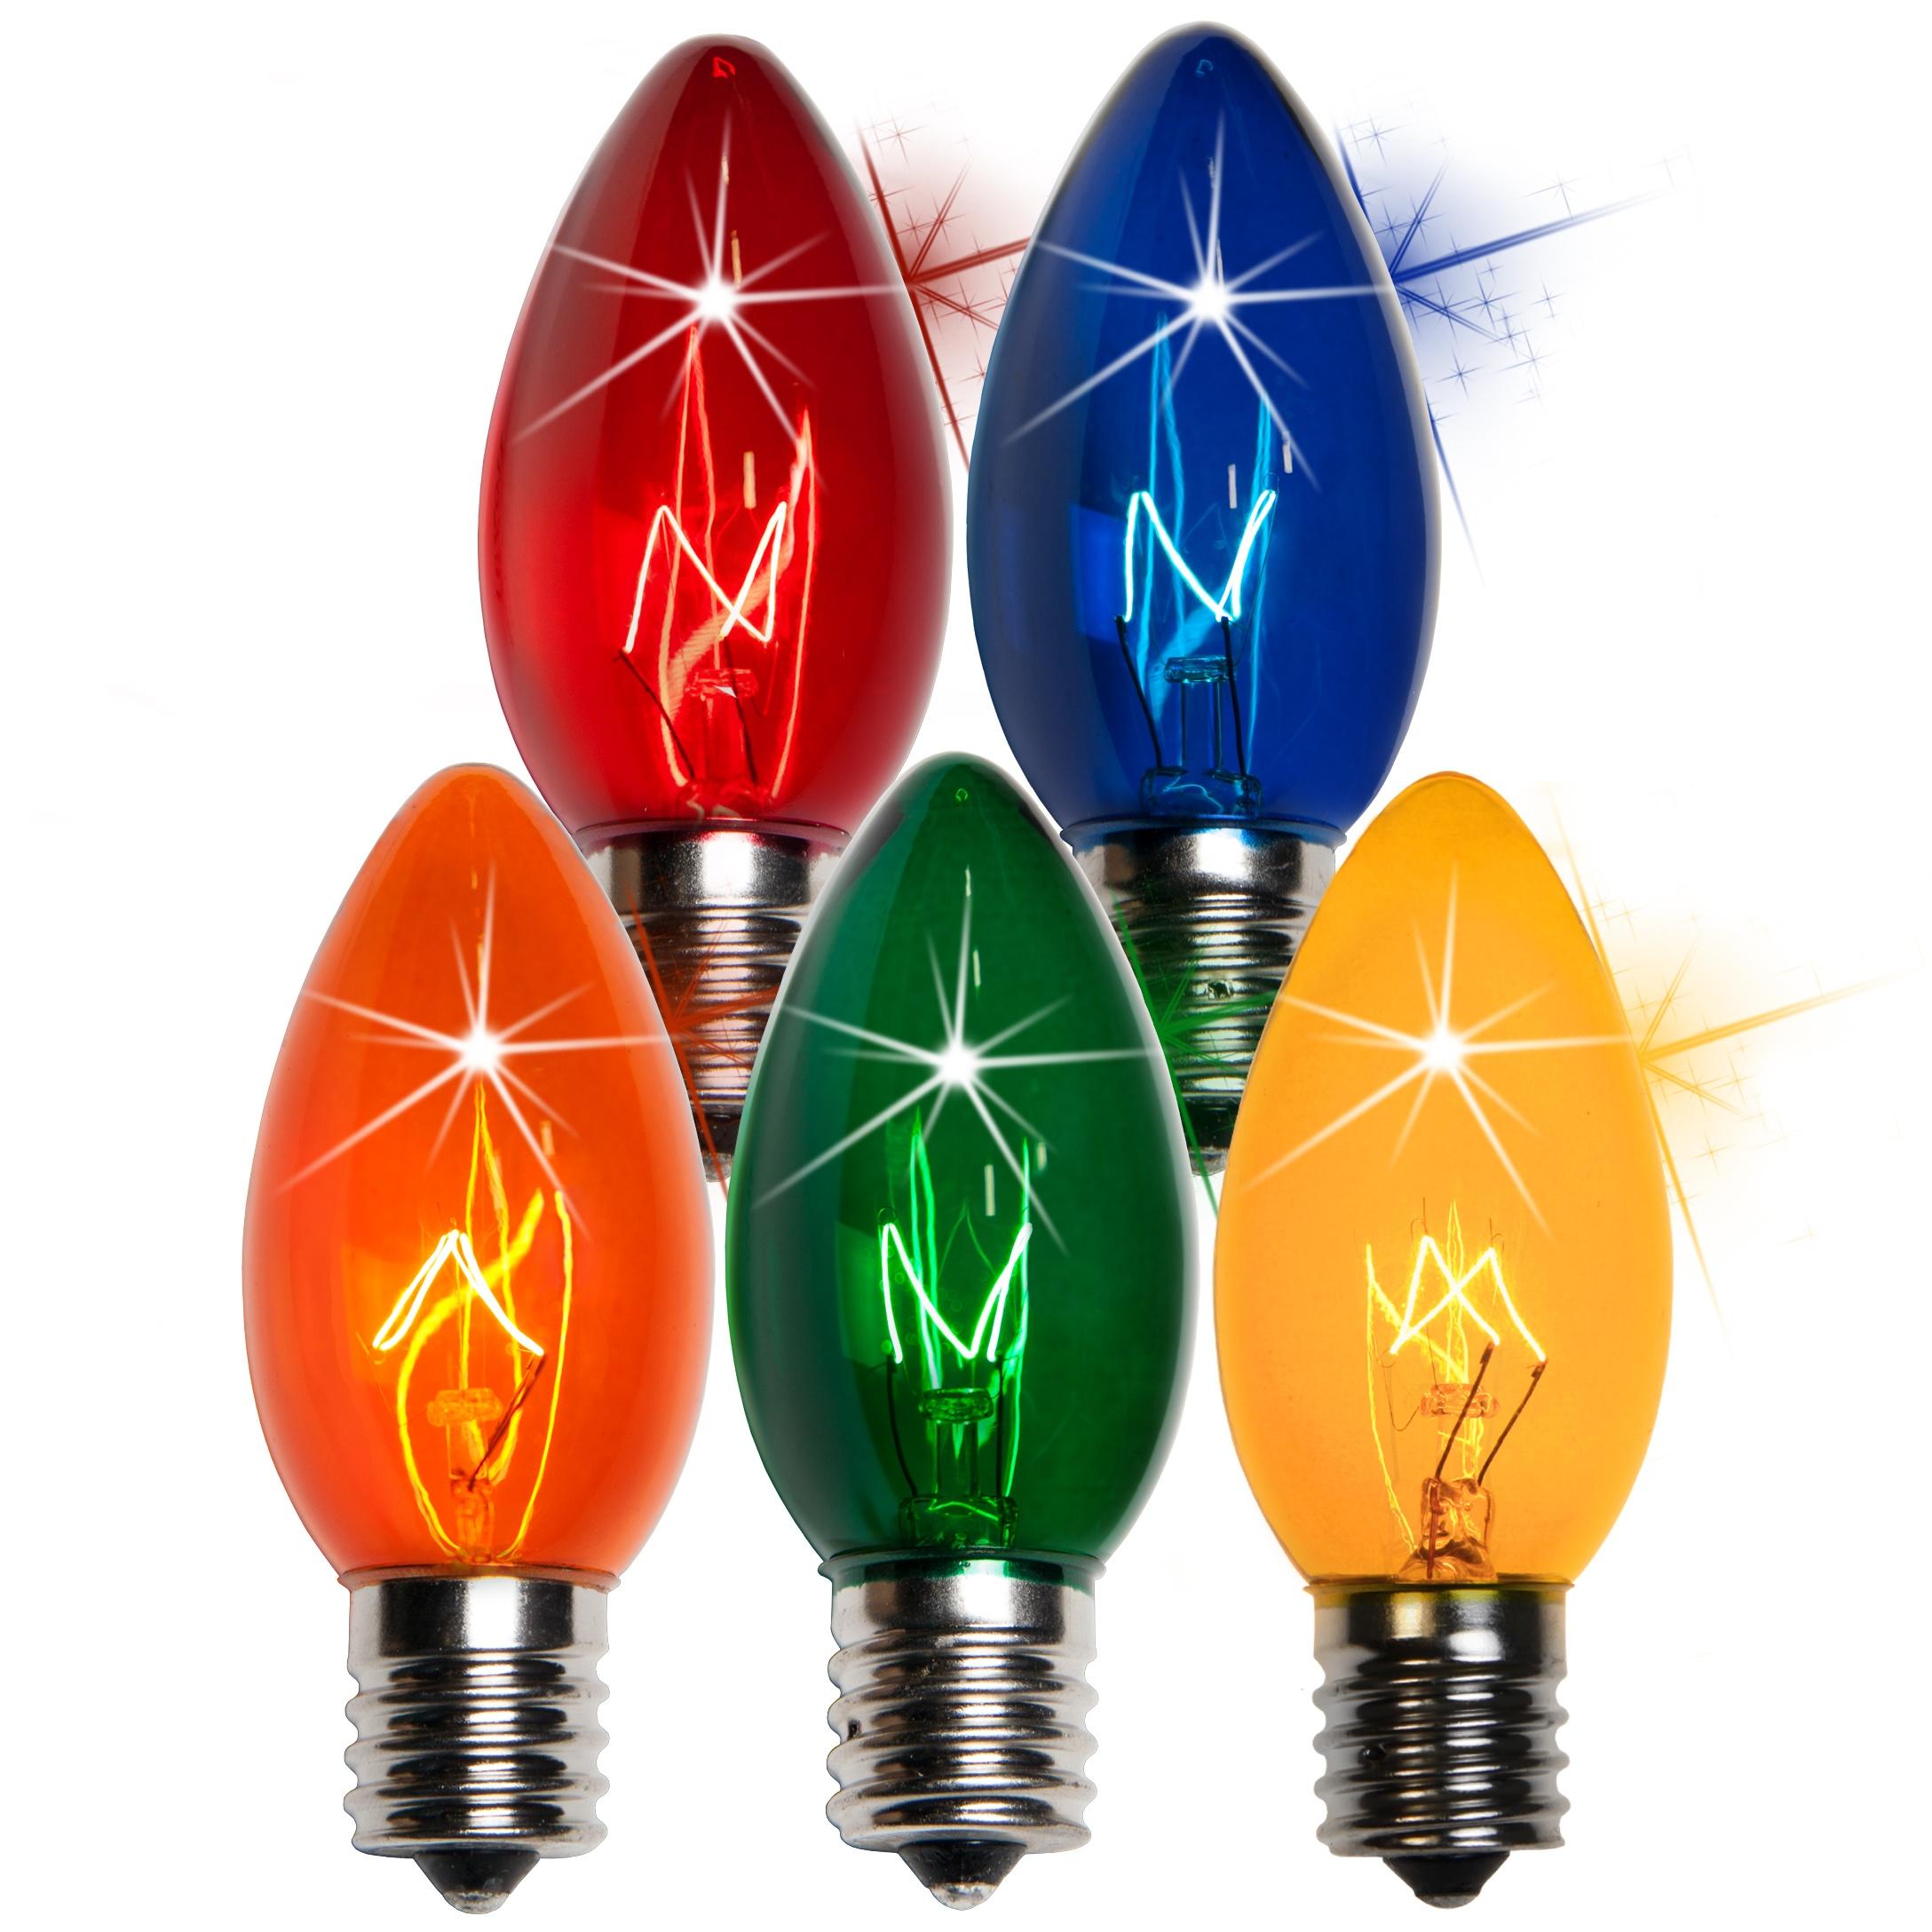 c9 christmas light bulb c9 twinkle multicolor christmas light bulbs. Black Bedroom Furniture Sets. Home Design Ideas